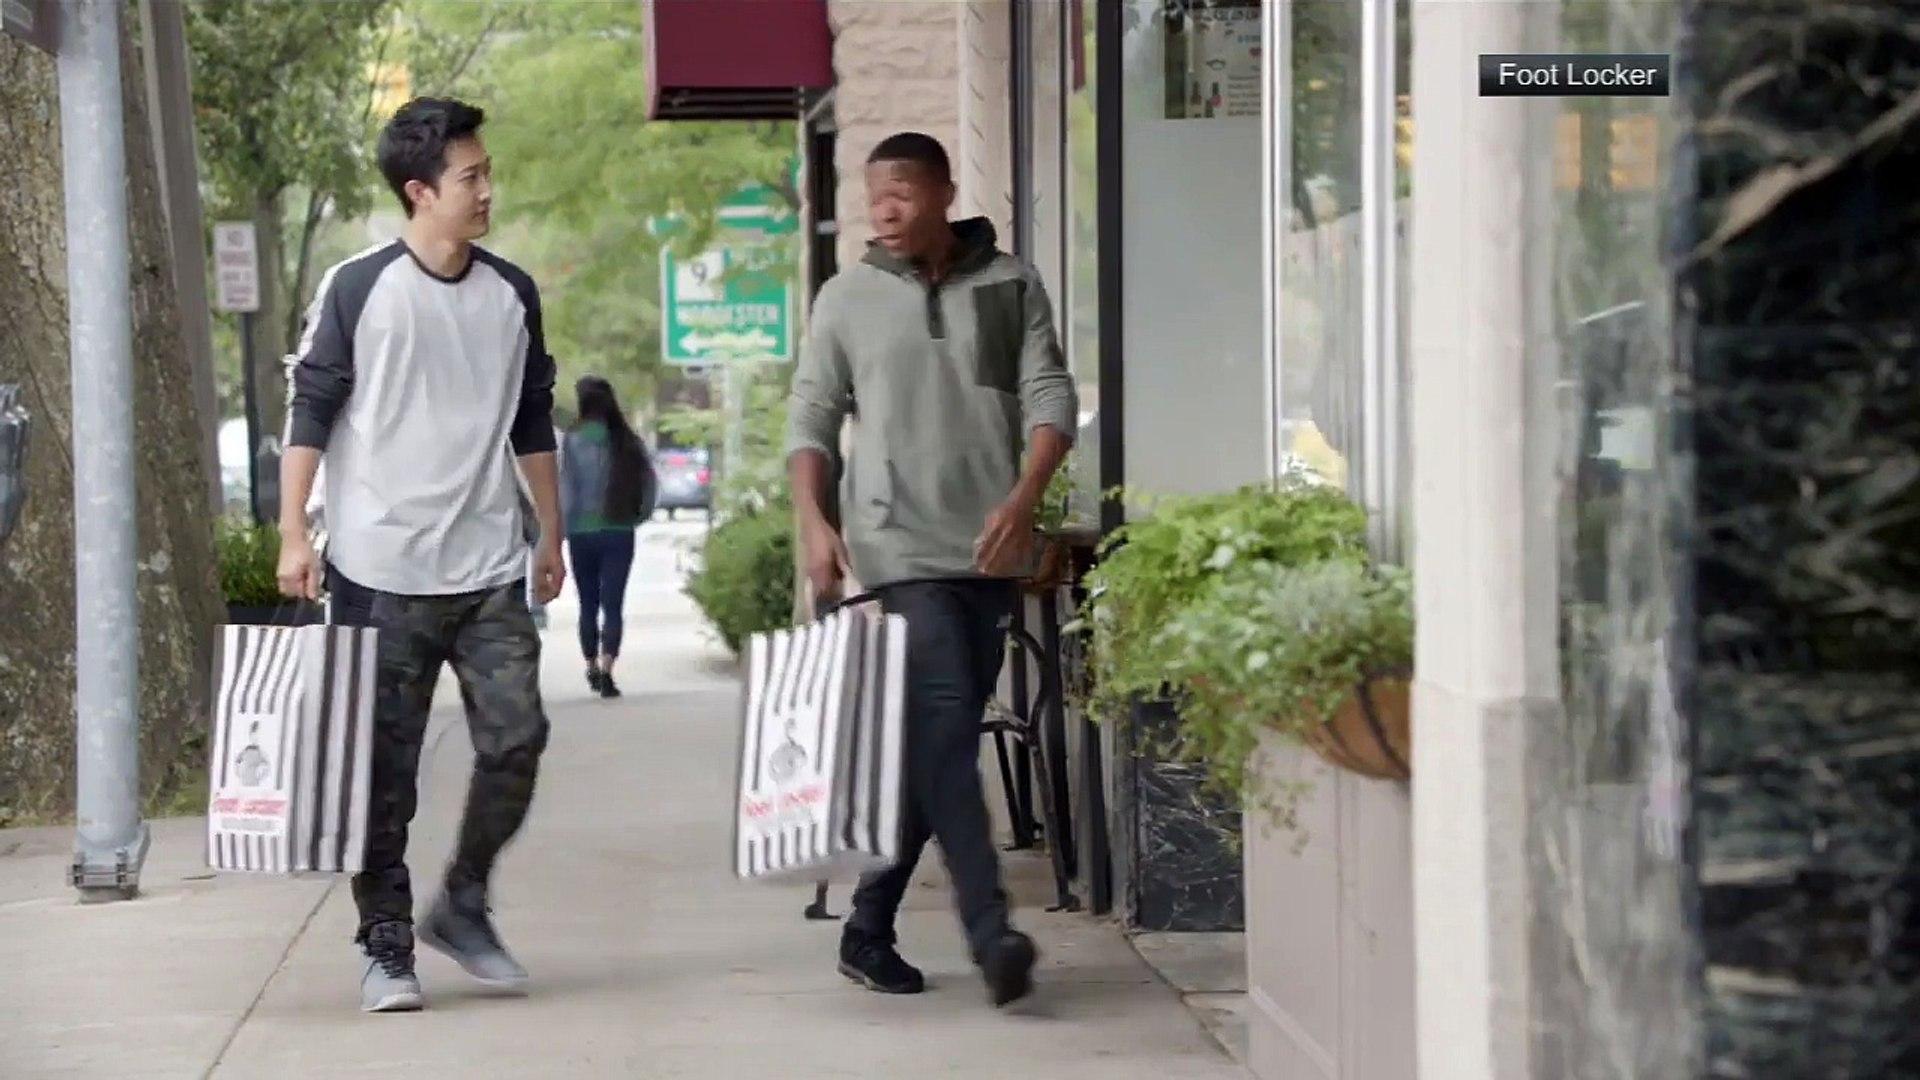 OFFICIAL FOOT LOCKER AD, Tom Brady makes fun of deflategate in Foot locker advert/Commercial. FUNNY!